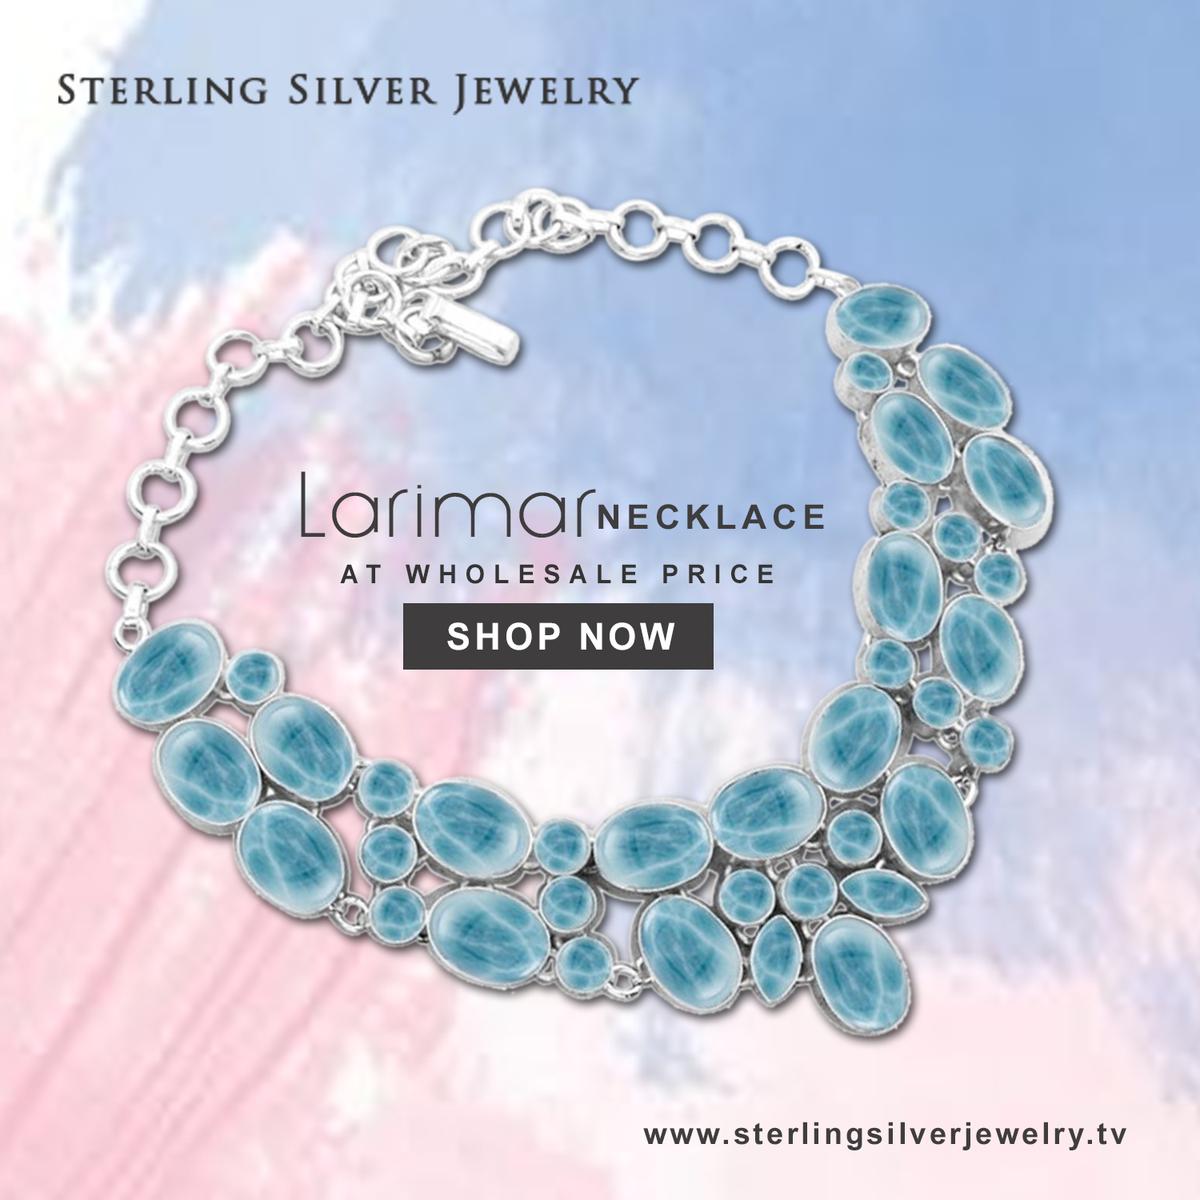 f:id:sterlingsilverjewelry:20190814213316j:plain